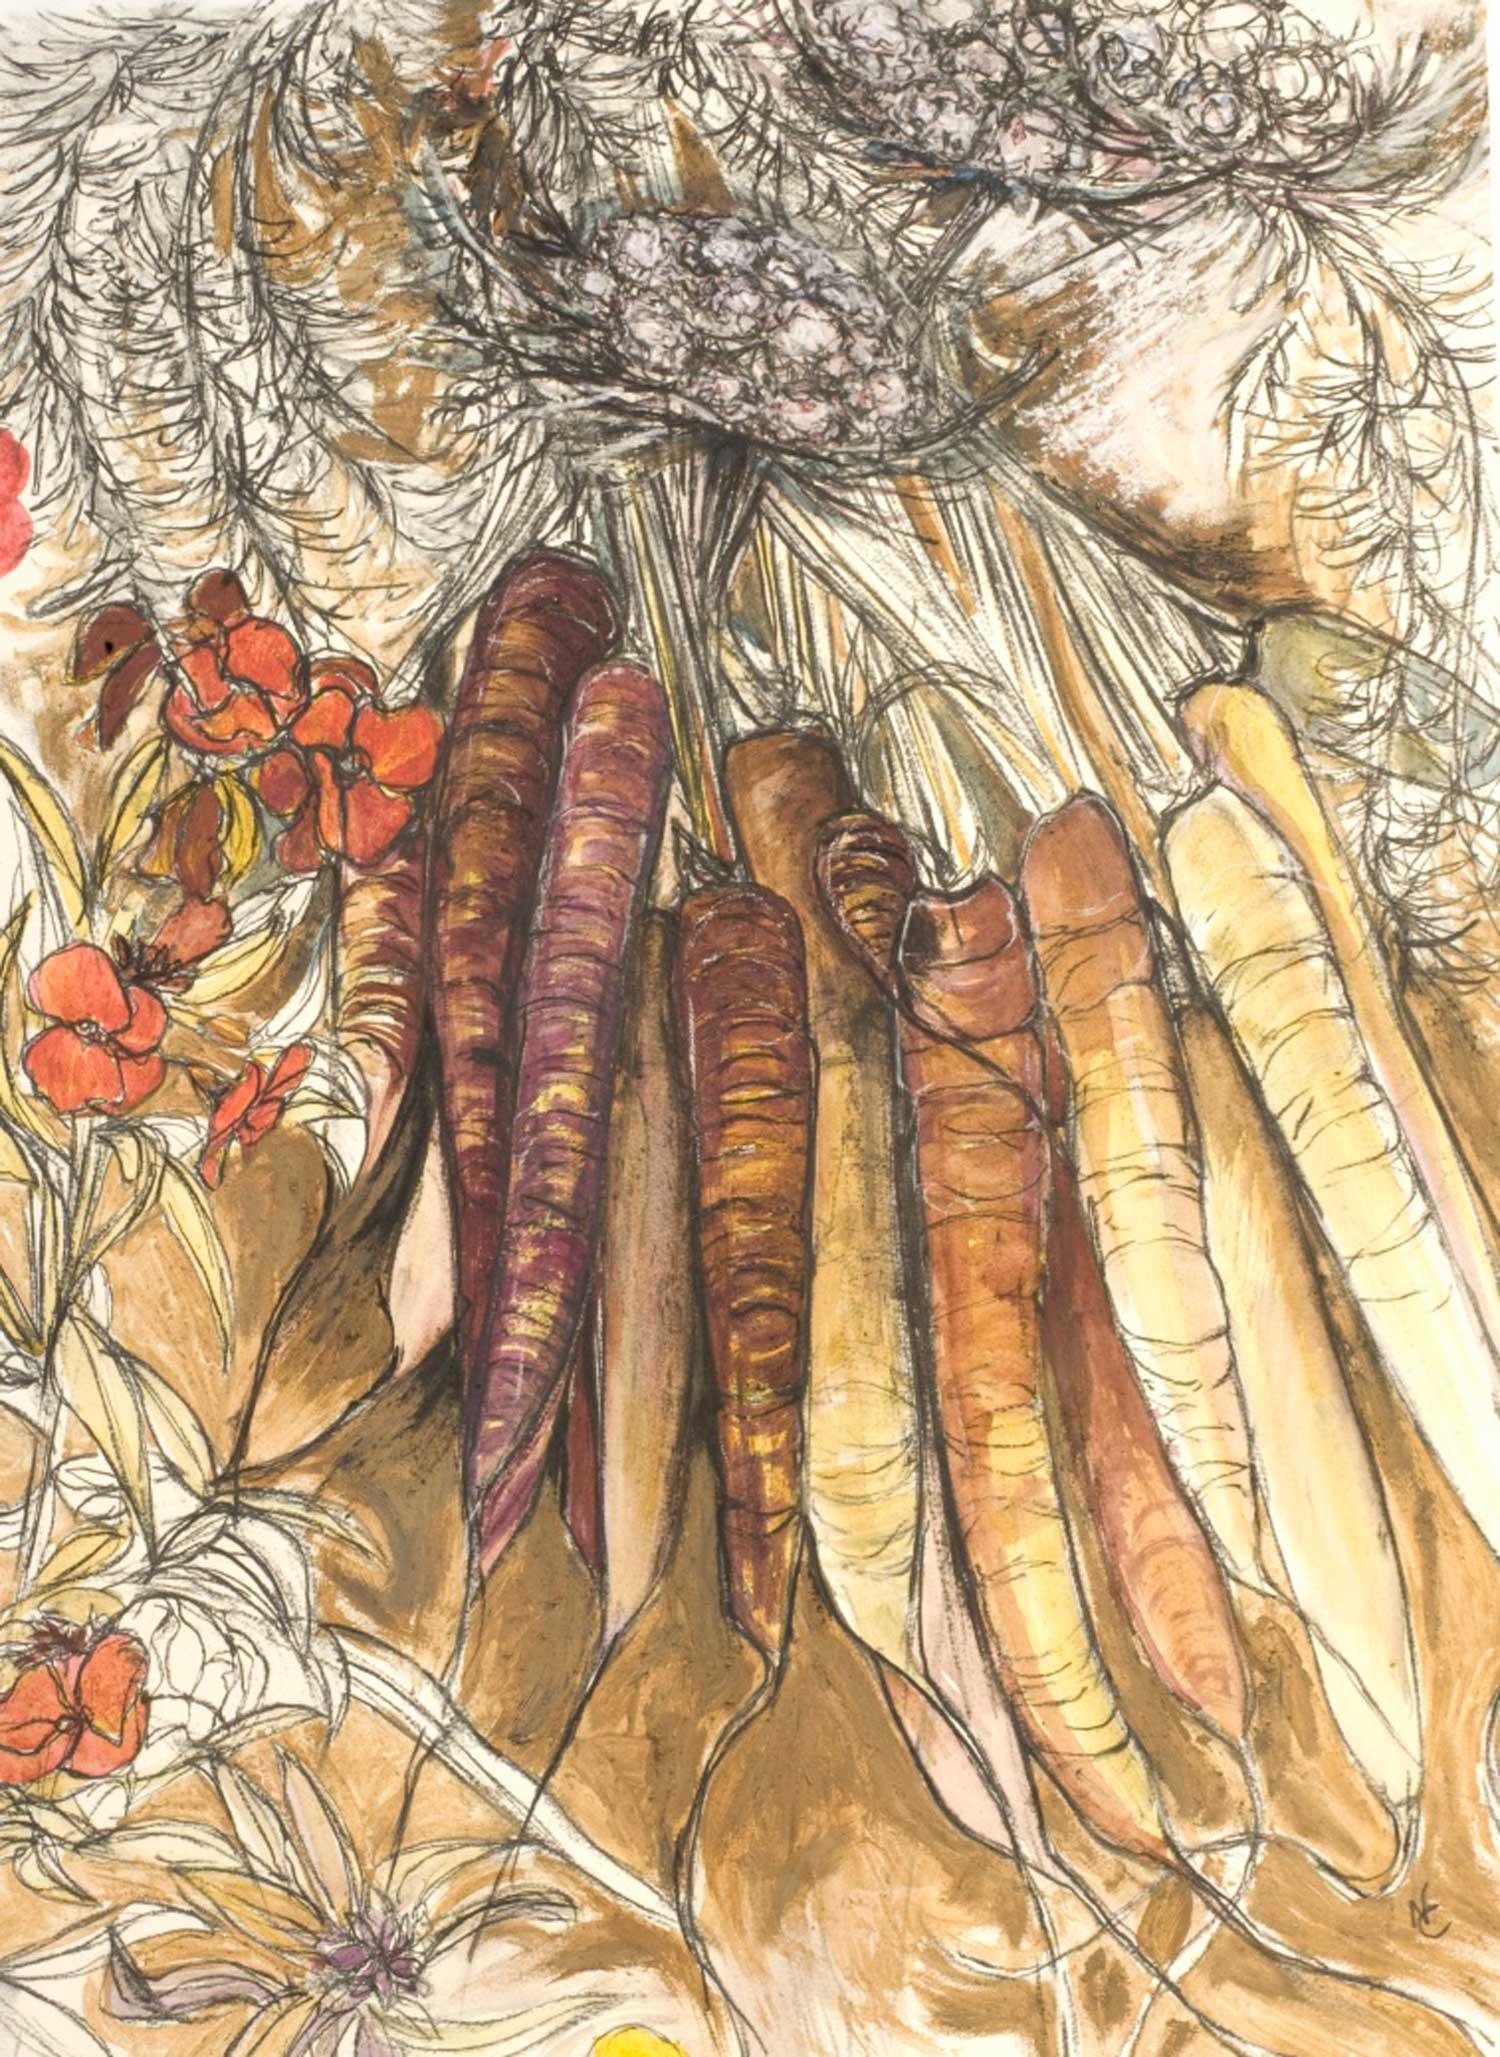 natashaclutterbuck-black-knight-carrots-&-crimson-wall-flowers.jpg